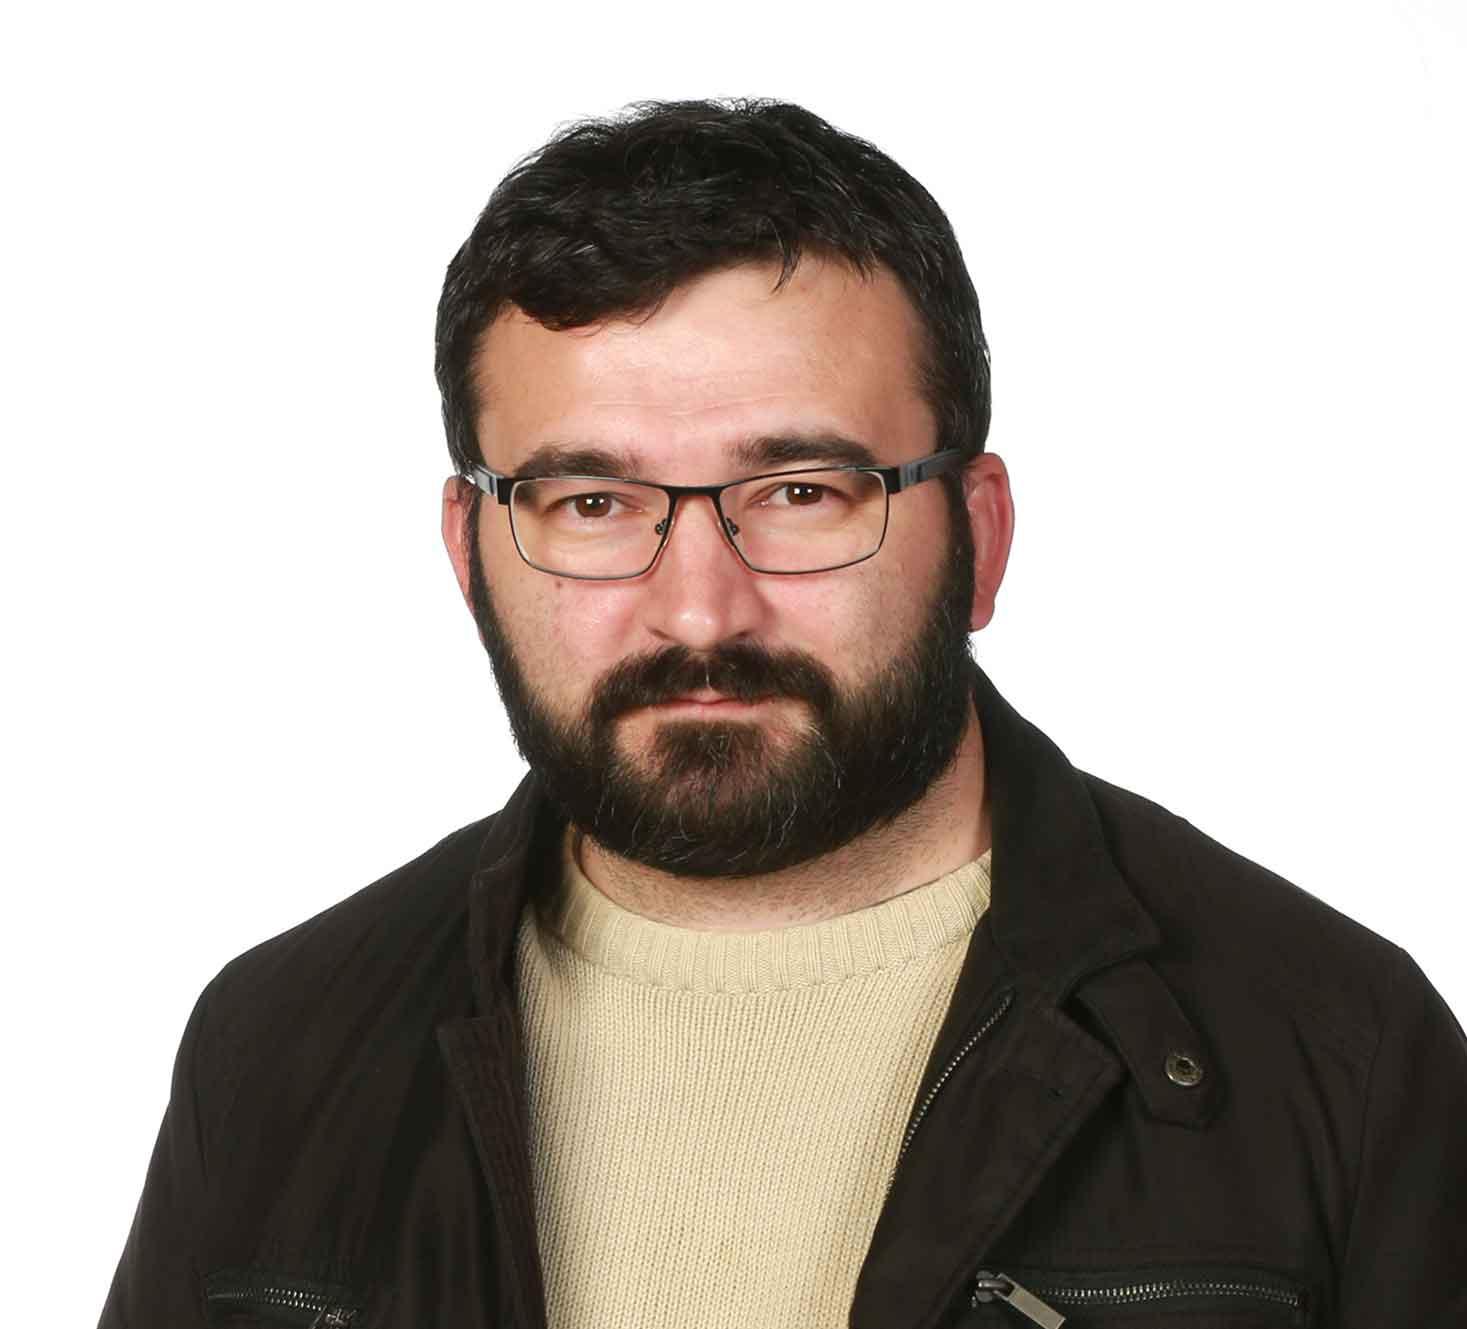 José Trujillo